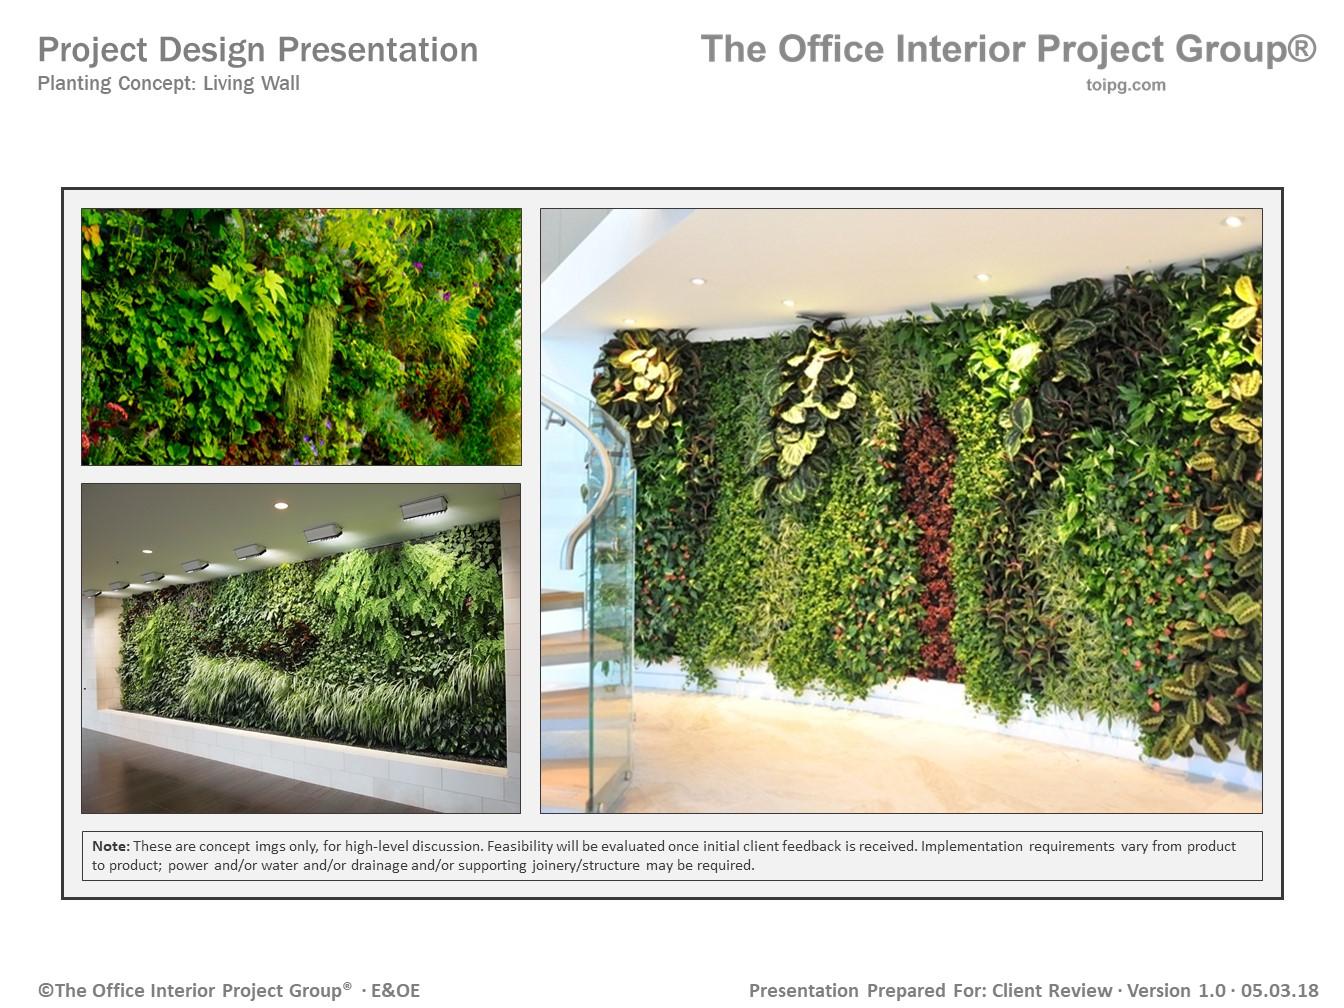 TOIPG® Design Presentation - Planting Concepts - Living Wall - 05.03.18.jpg